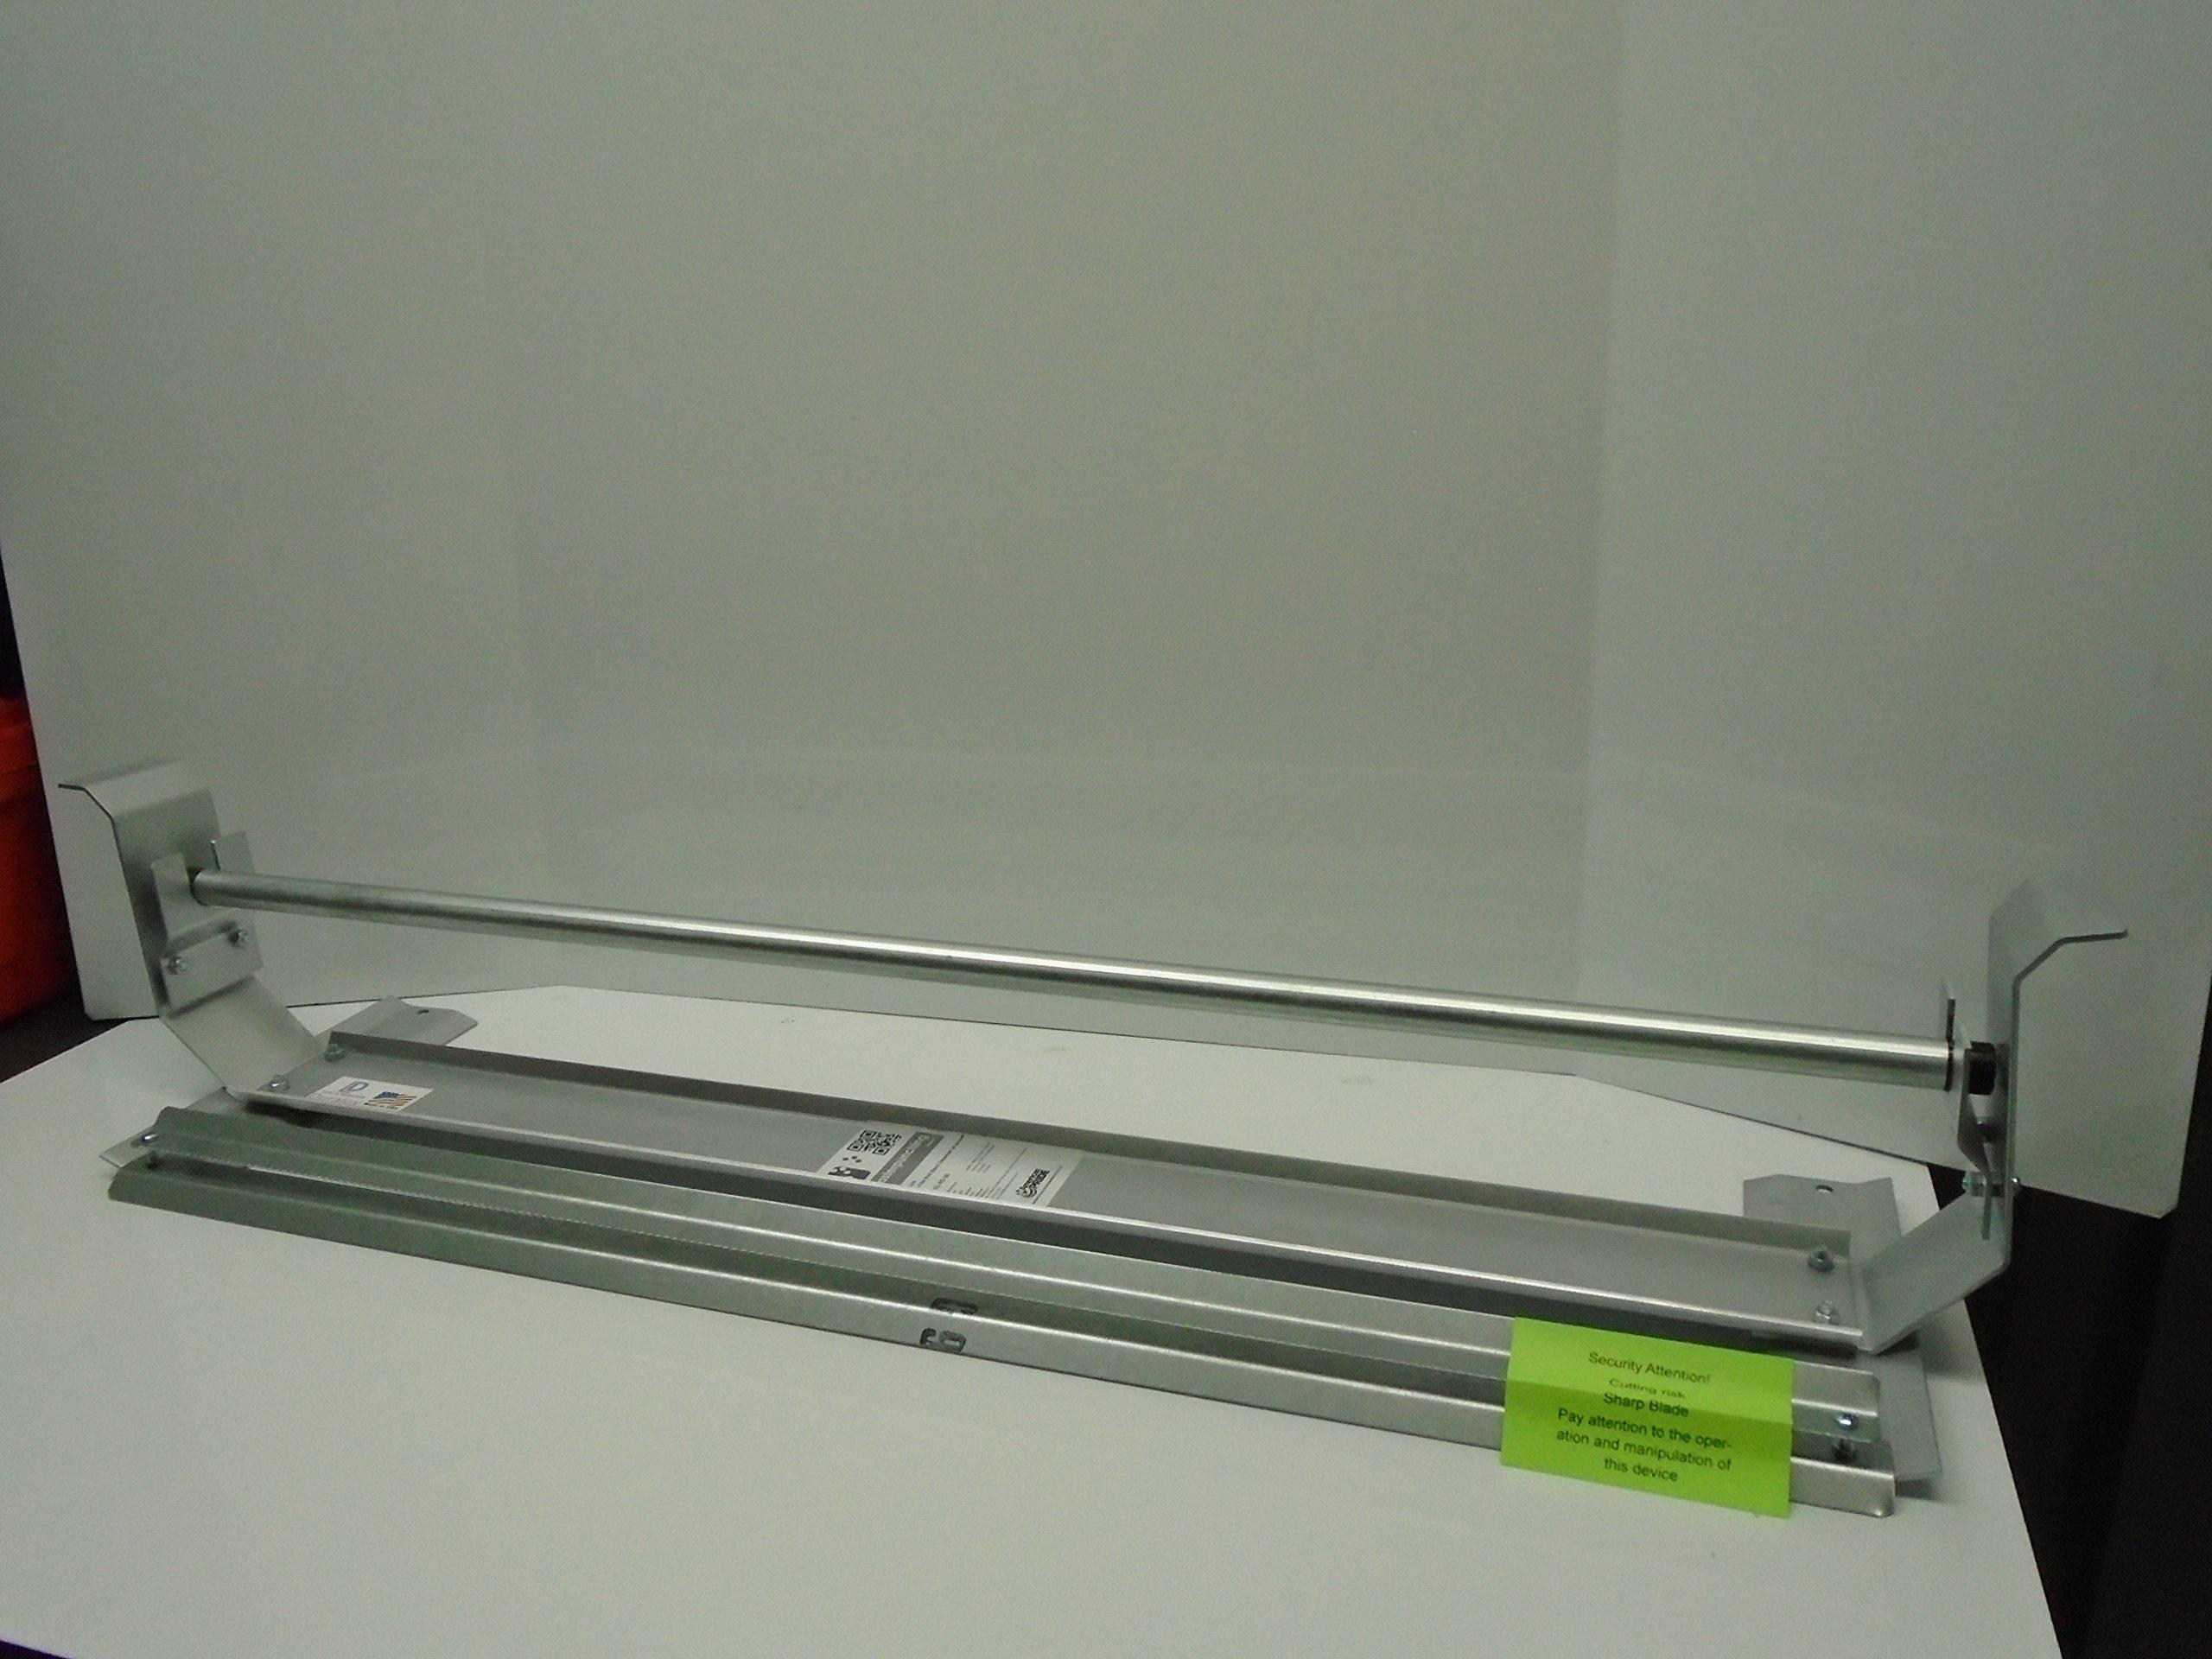 Paper Cutter Roll Dispenser Econoline 60 inches table mount Kraft paper Duralov by Duralov (Image #3)